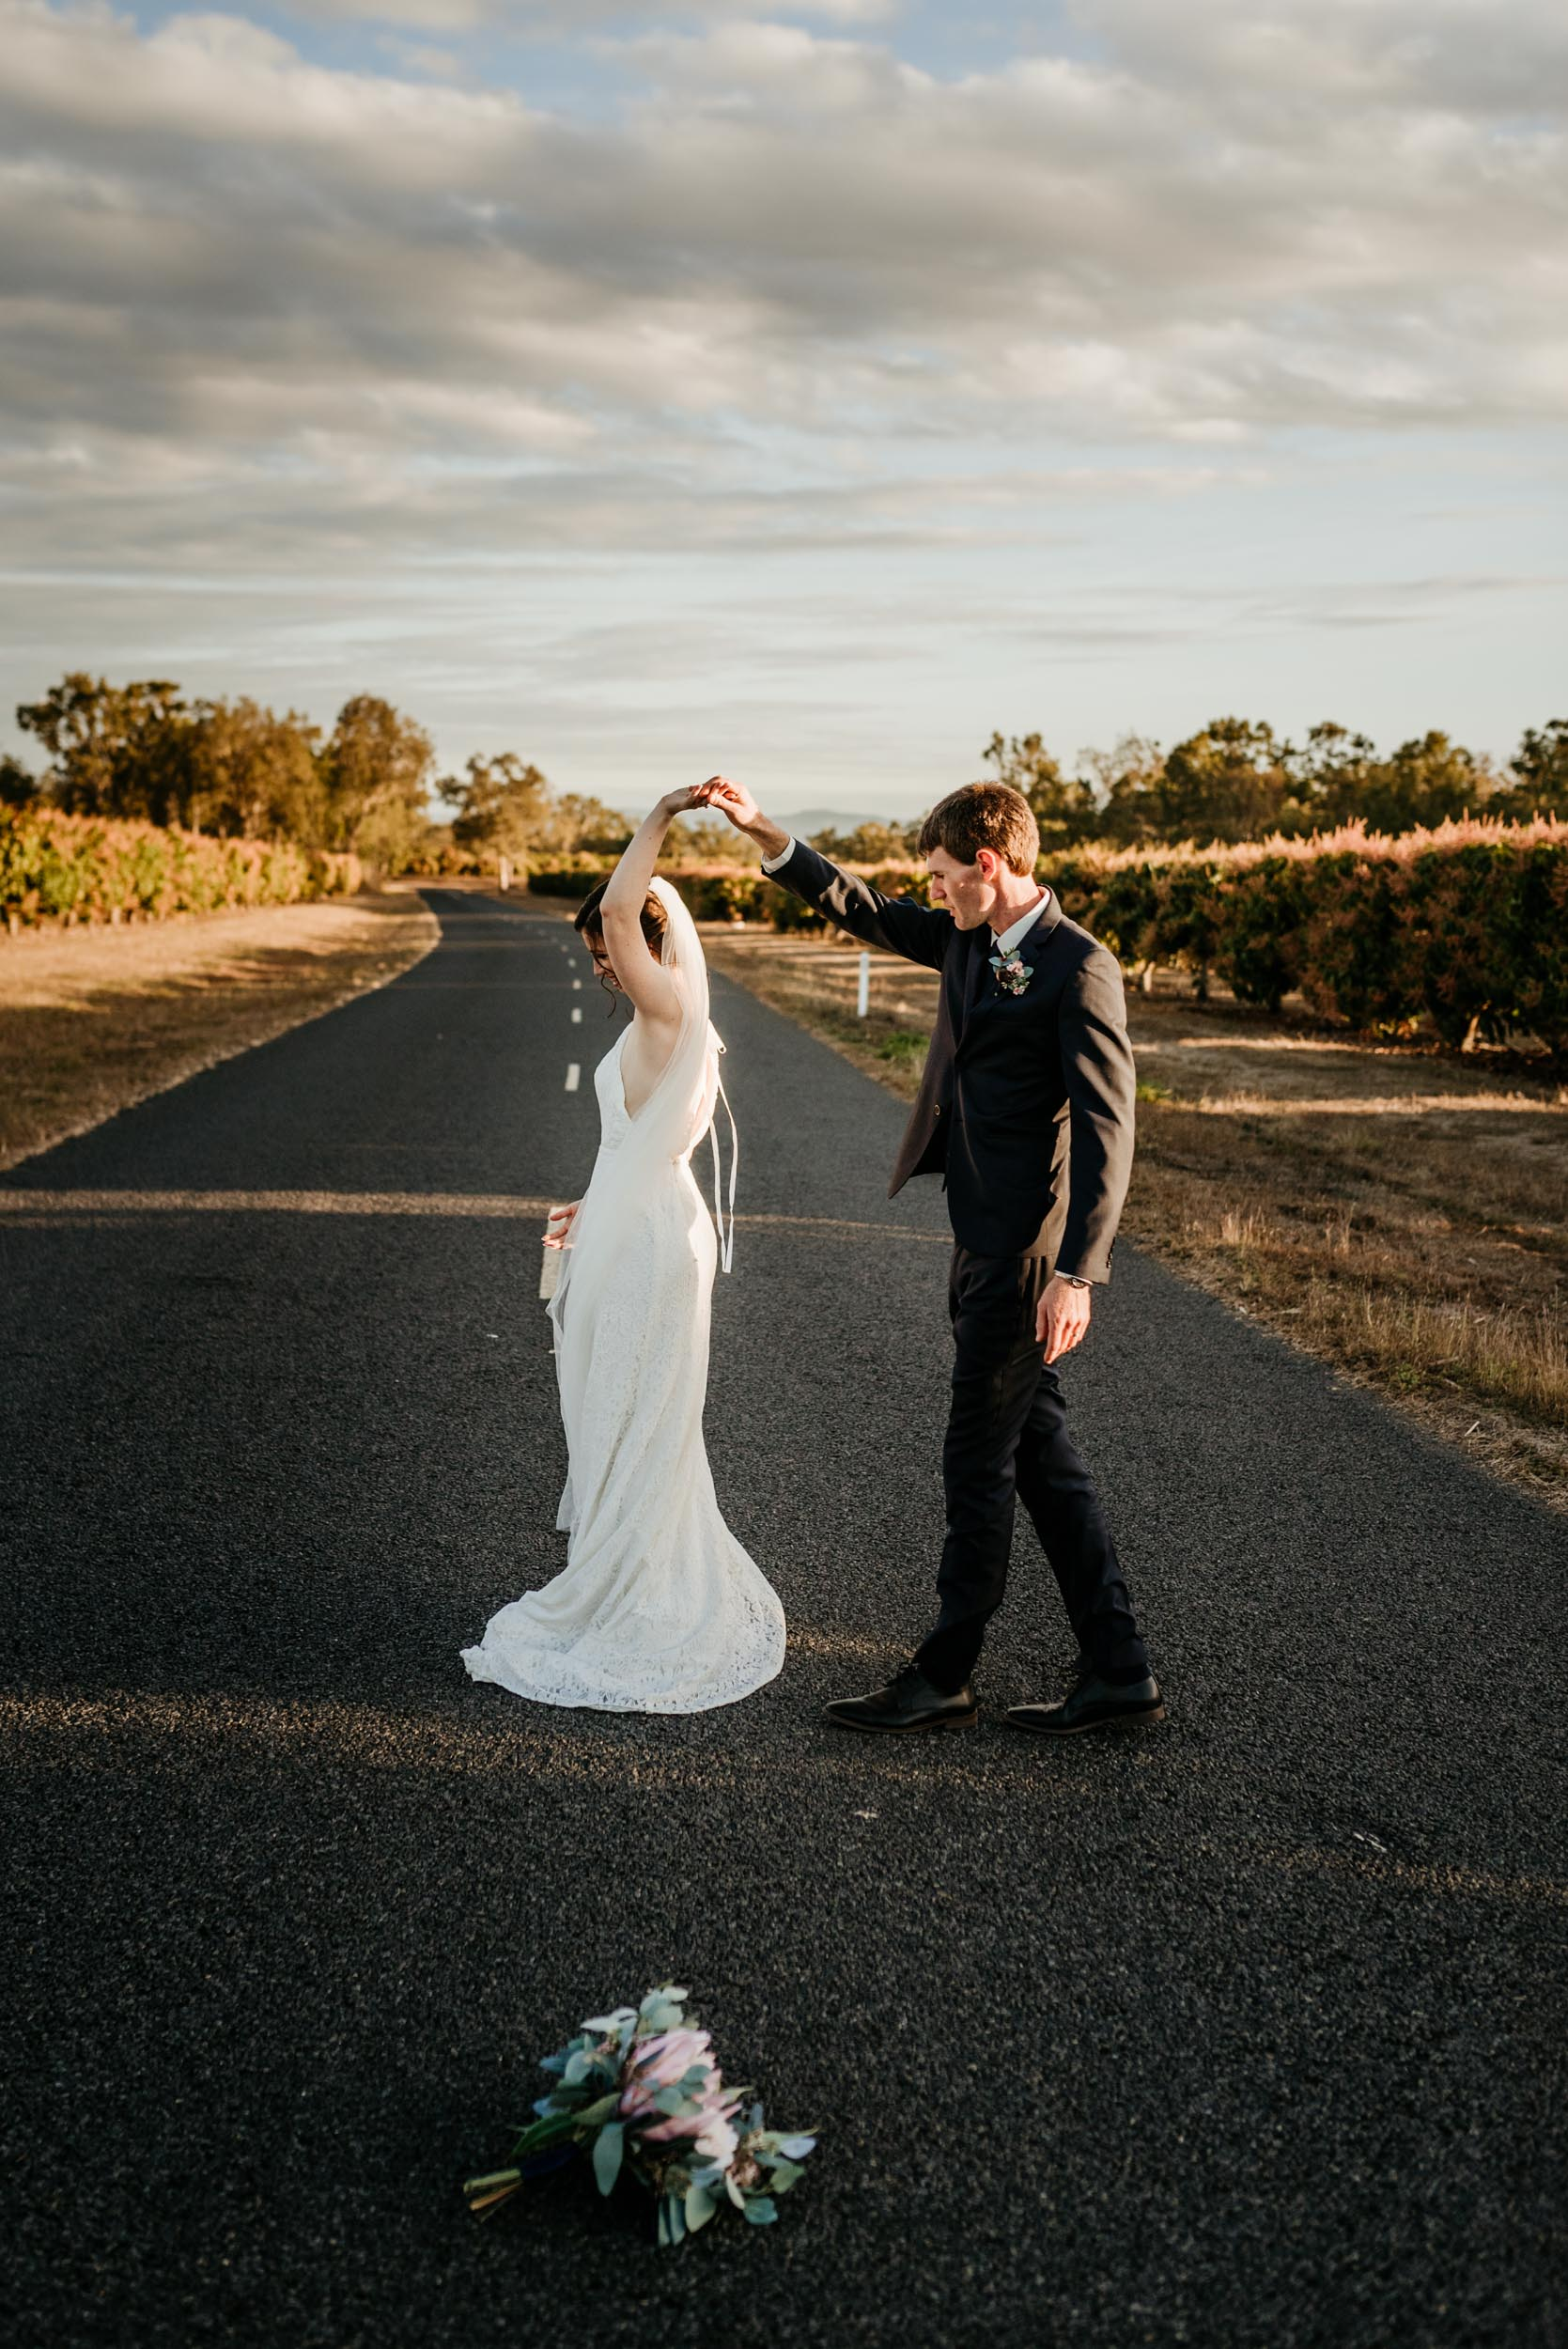 The Raw Photographer - Cairns Wedding Photographer - Atherton Tablelands Venue - Mareeba Photography-53.jpg